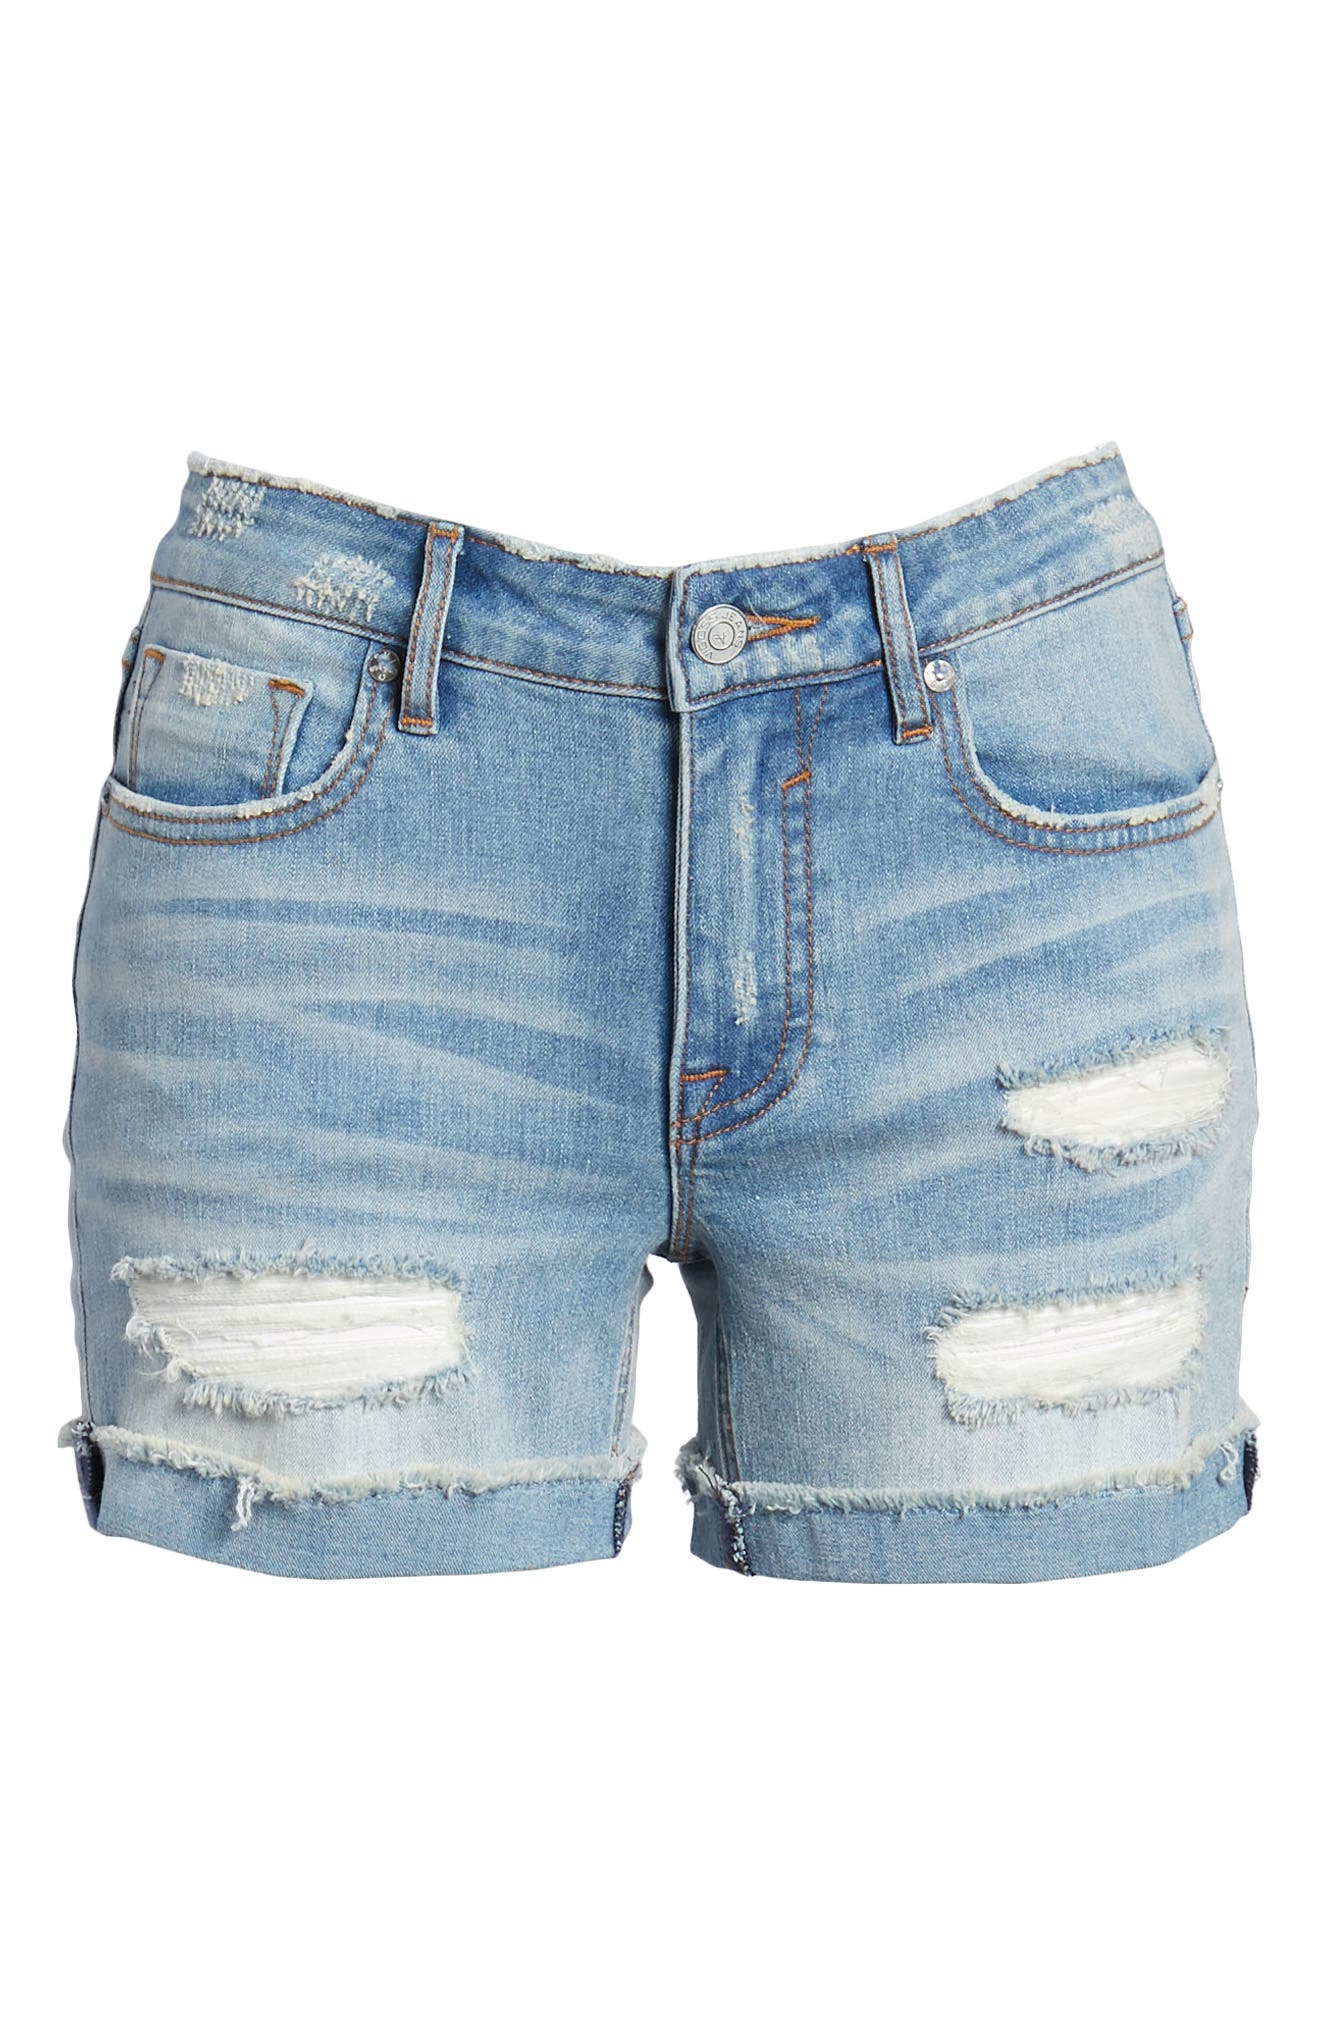 Marley Denim Shorts,                             Alternate thumbnail 7, color,                             Light Wash